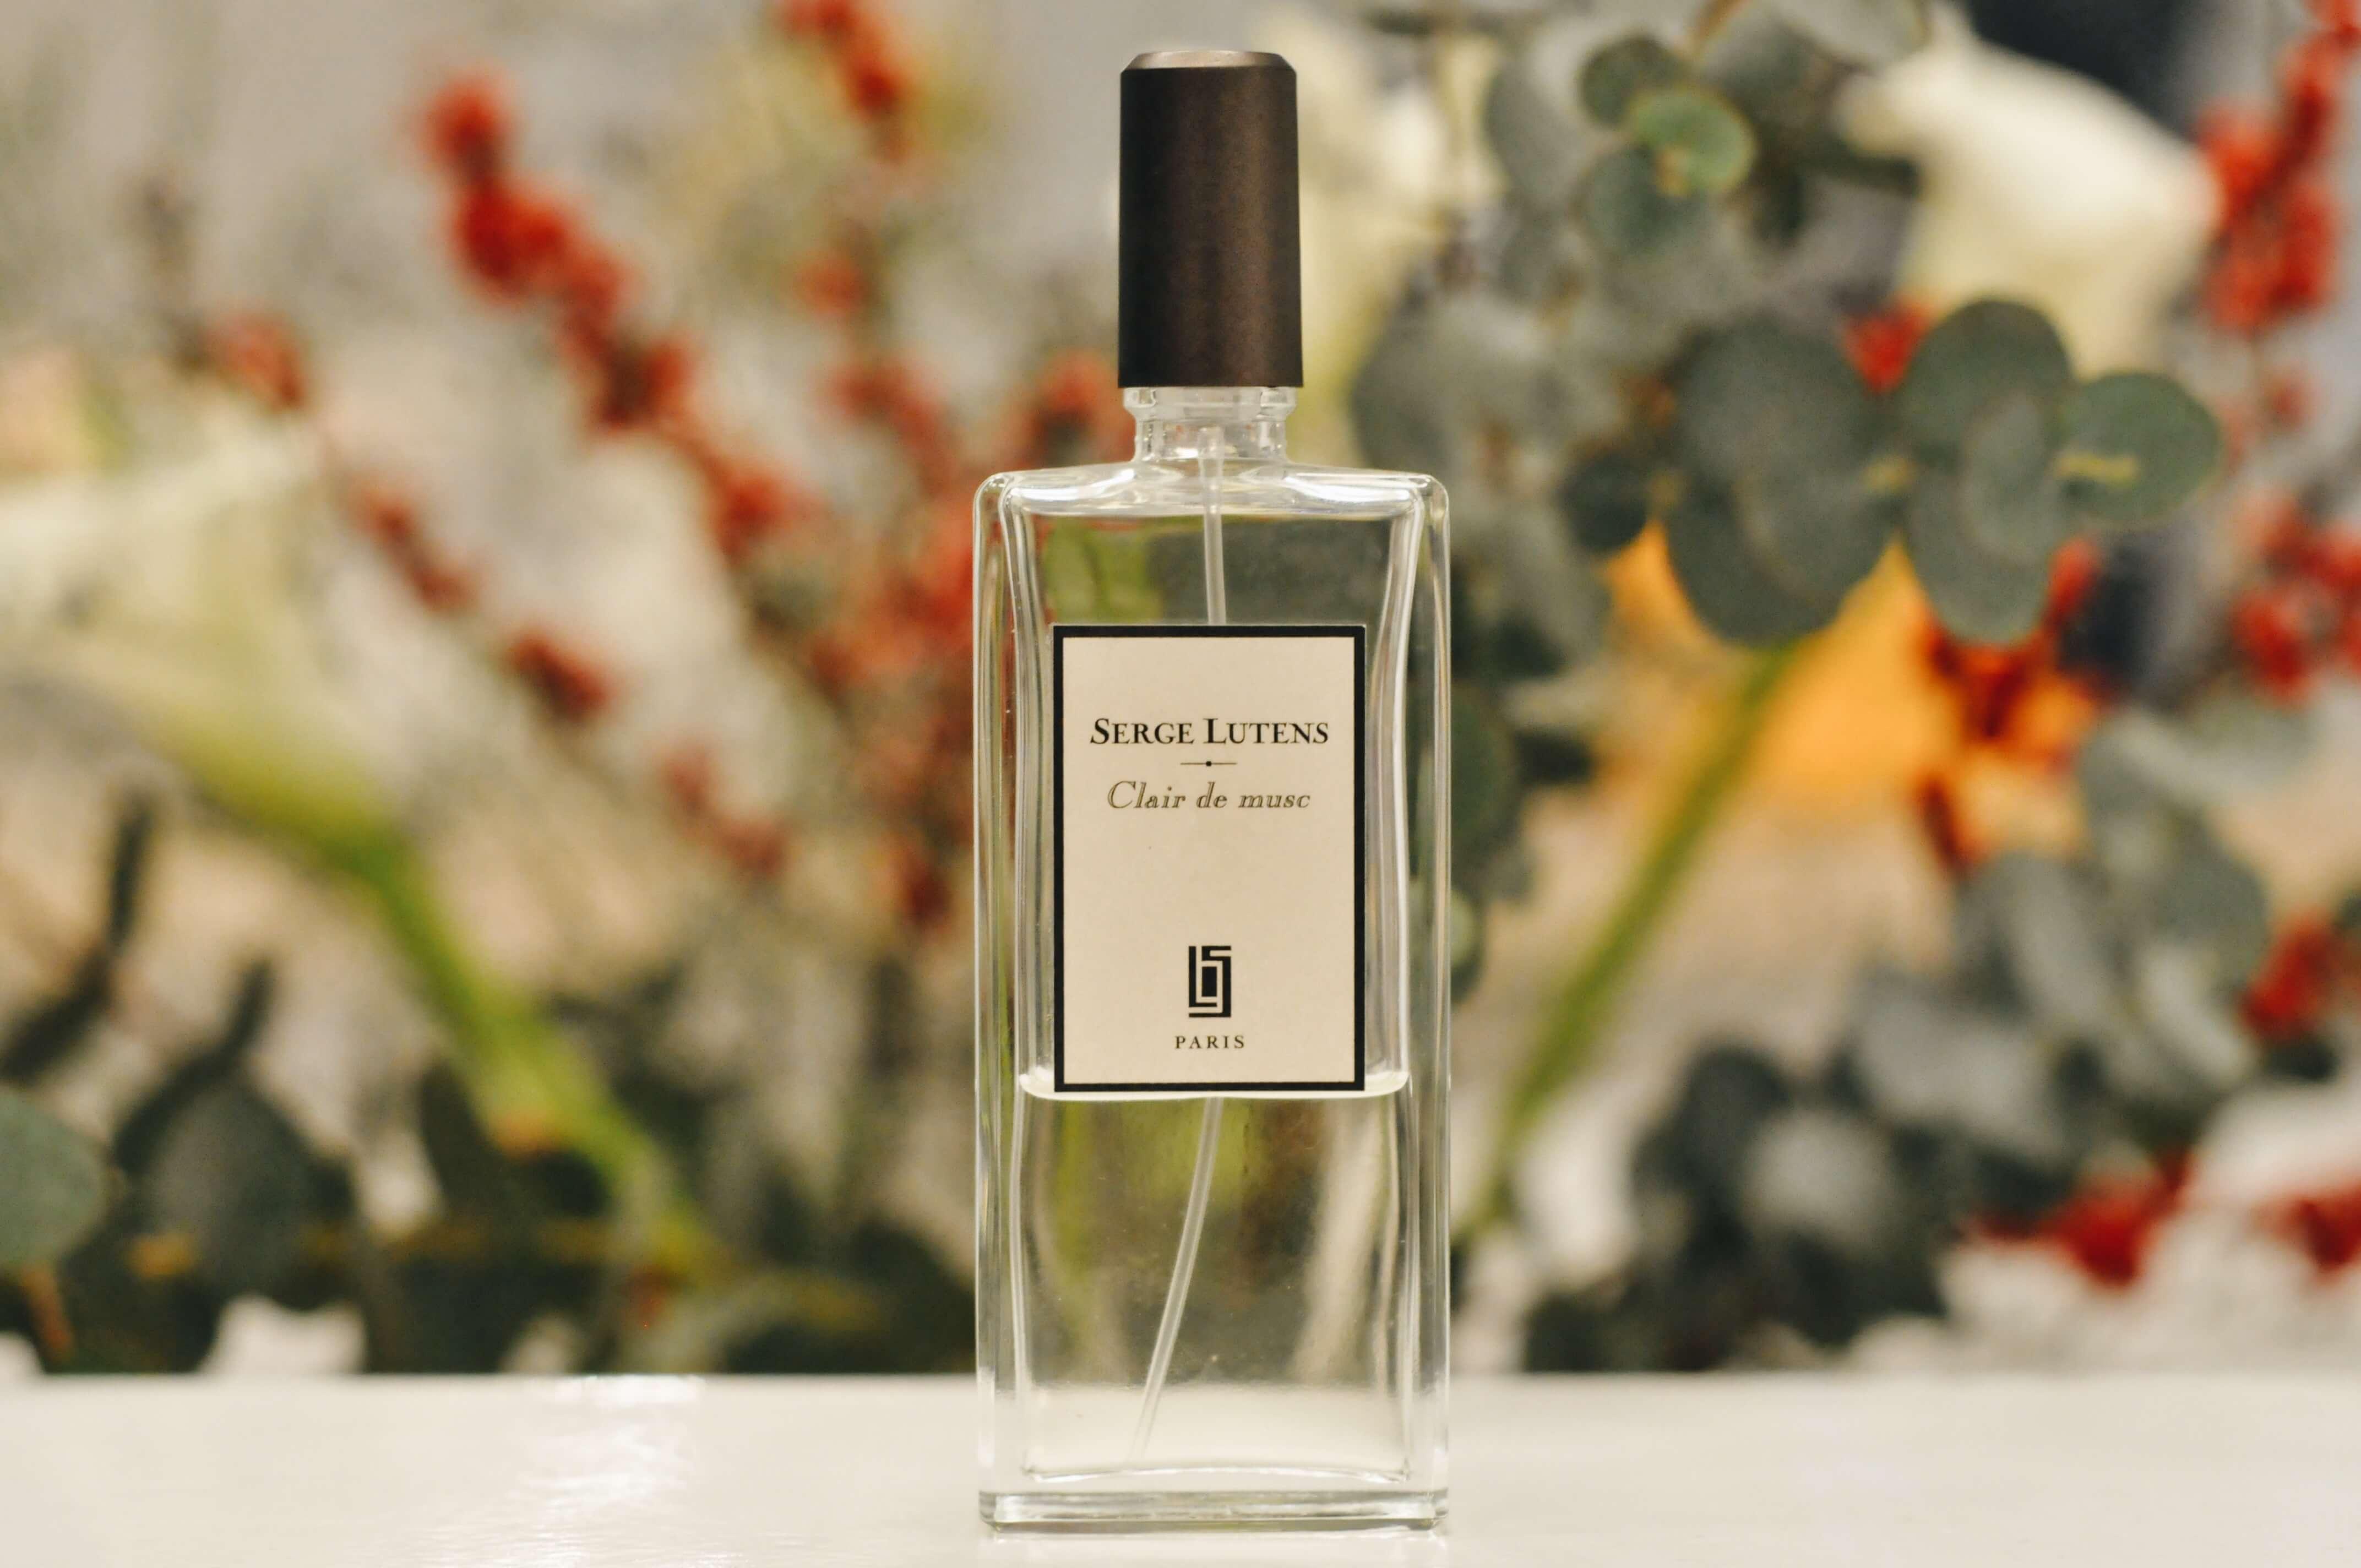 Serge lutens perfuma z piżmem